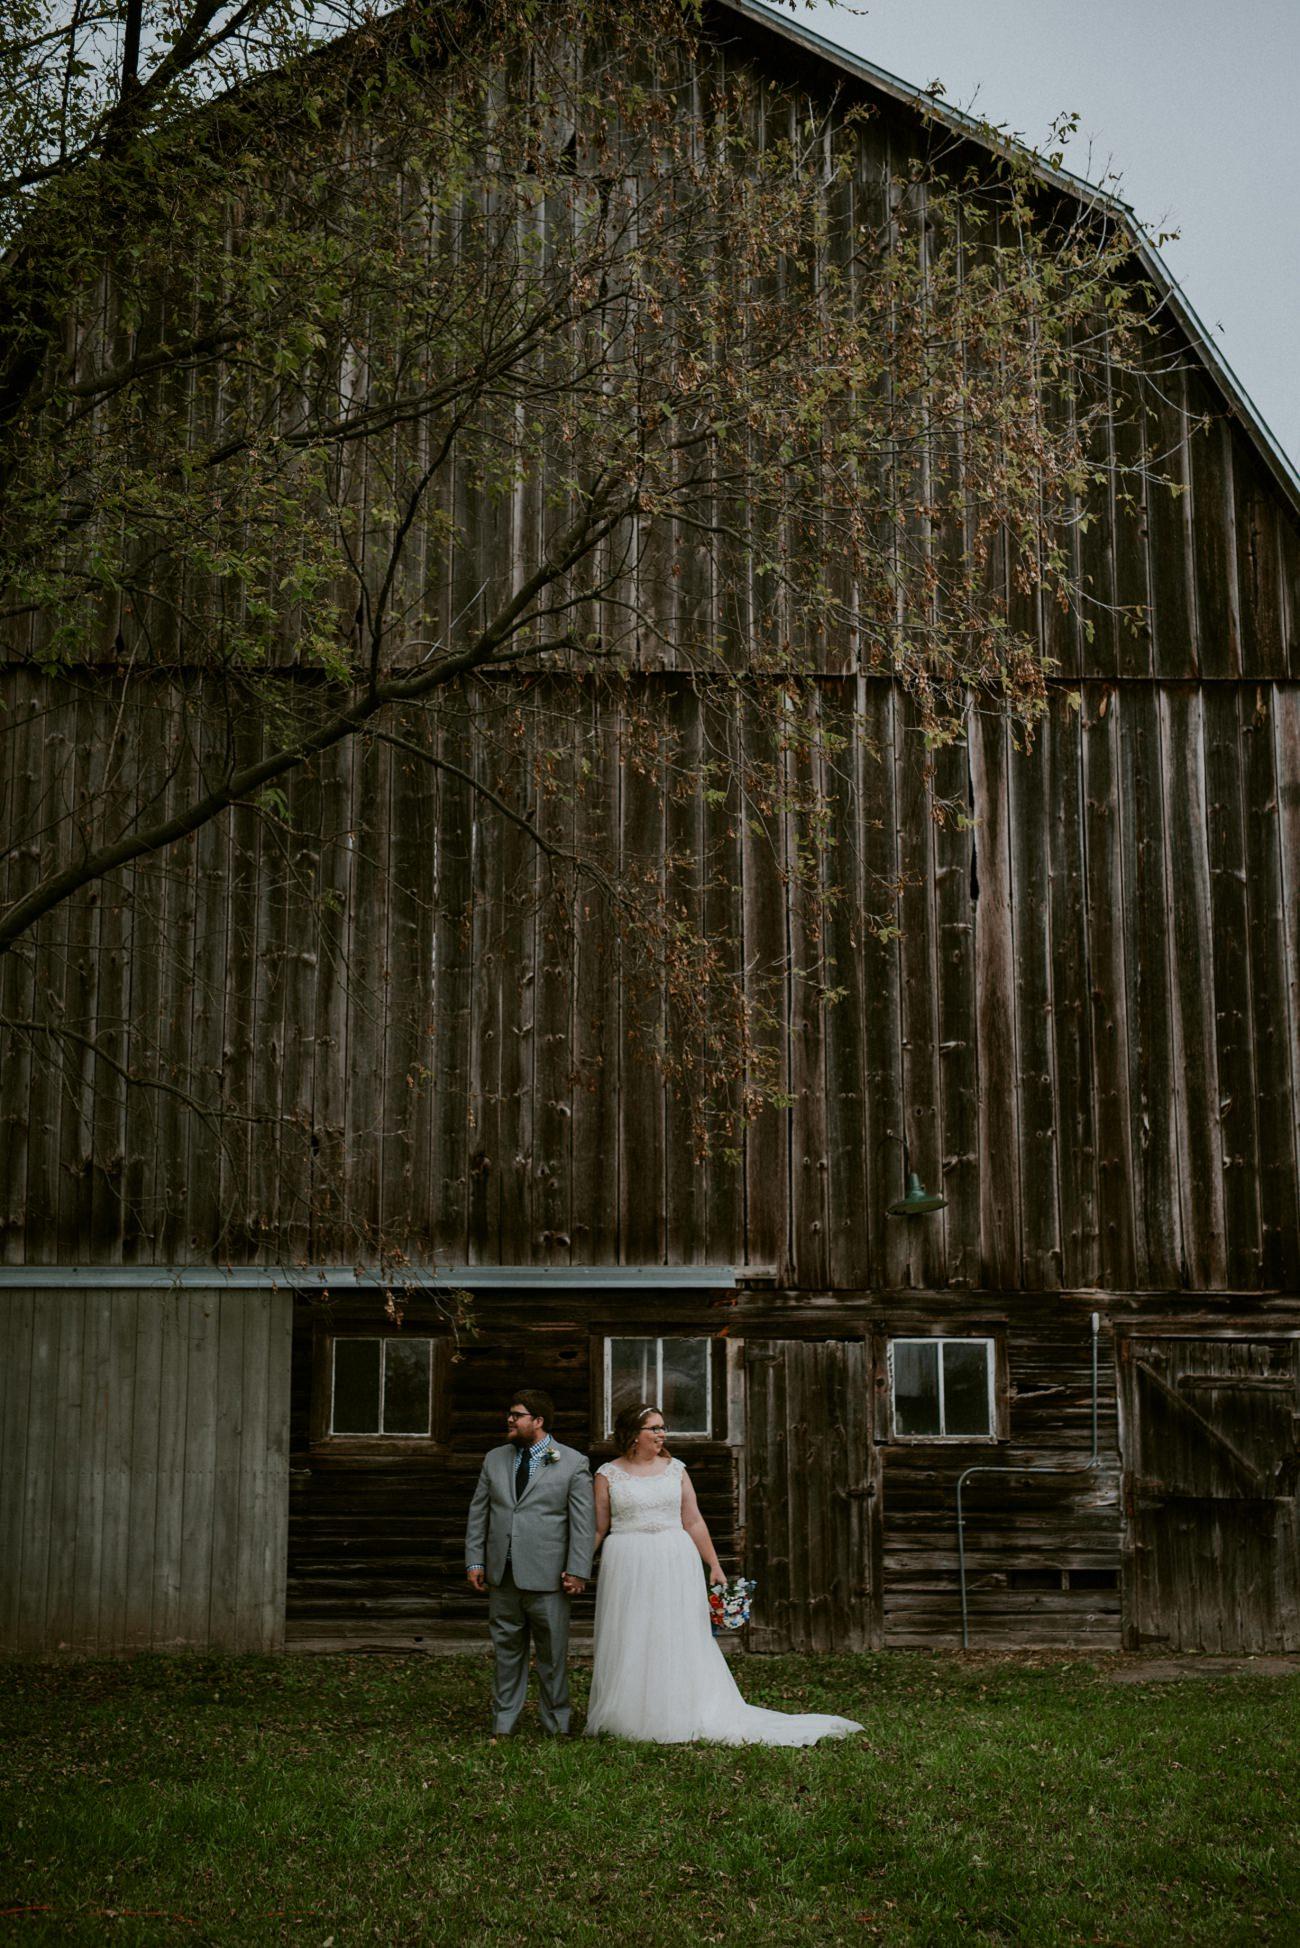 Waupaca Wi Wedding | Barn Wedding